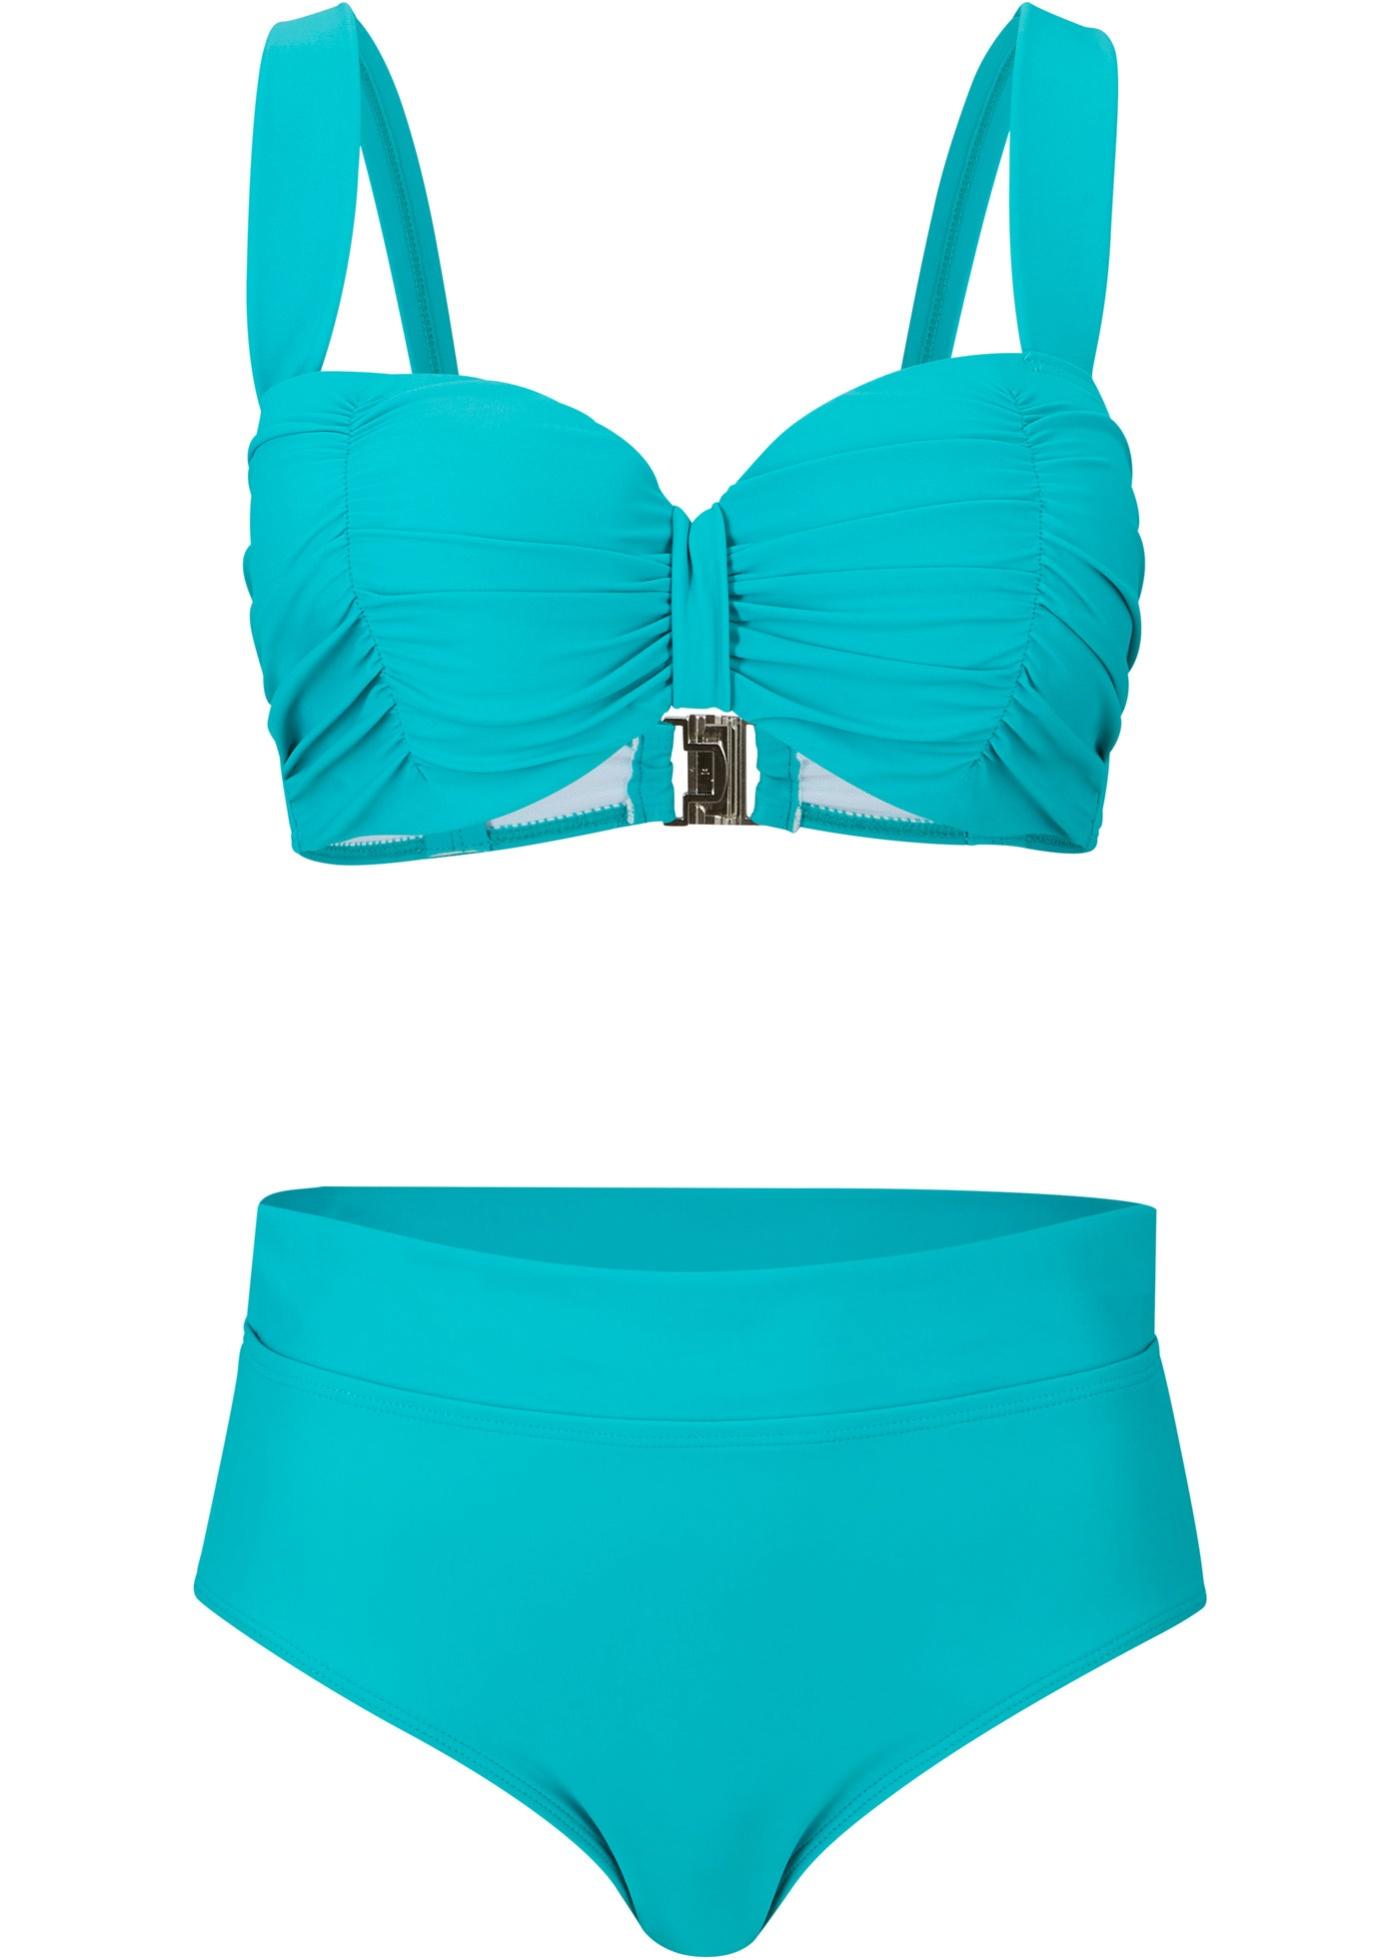 Bikini avec armatures (Ens. 2 pces.)